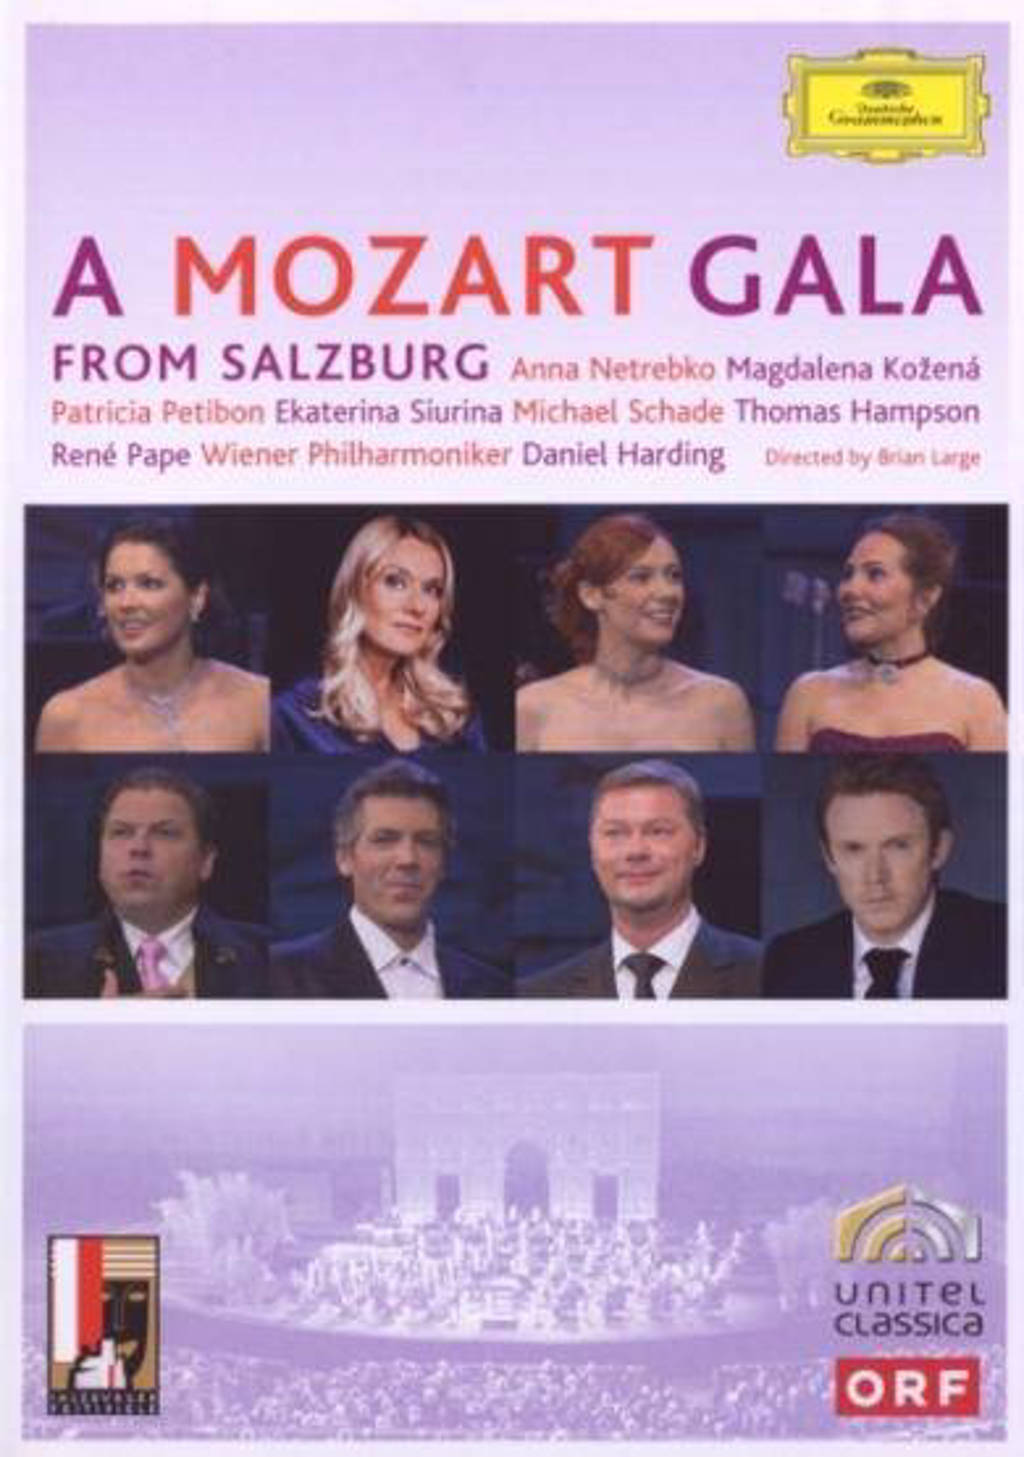 Mozart gala Salzburg (DVD)